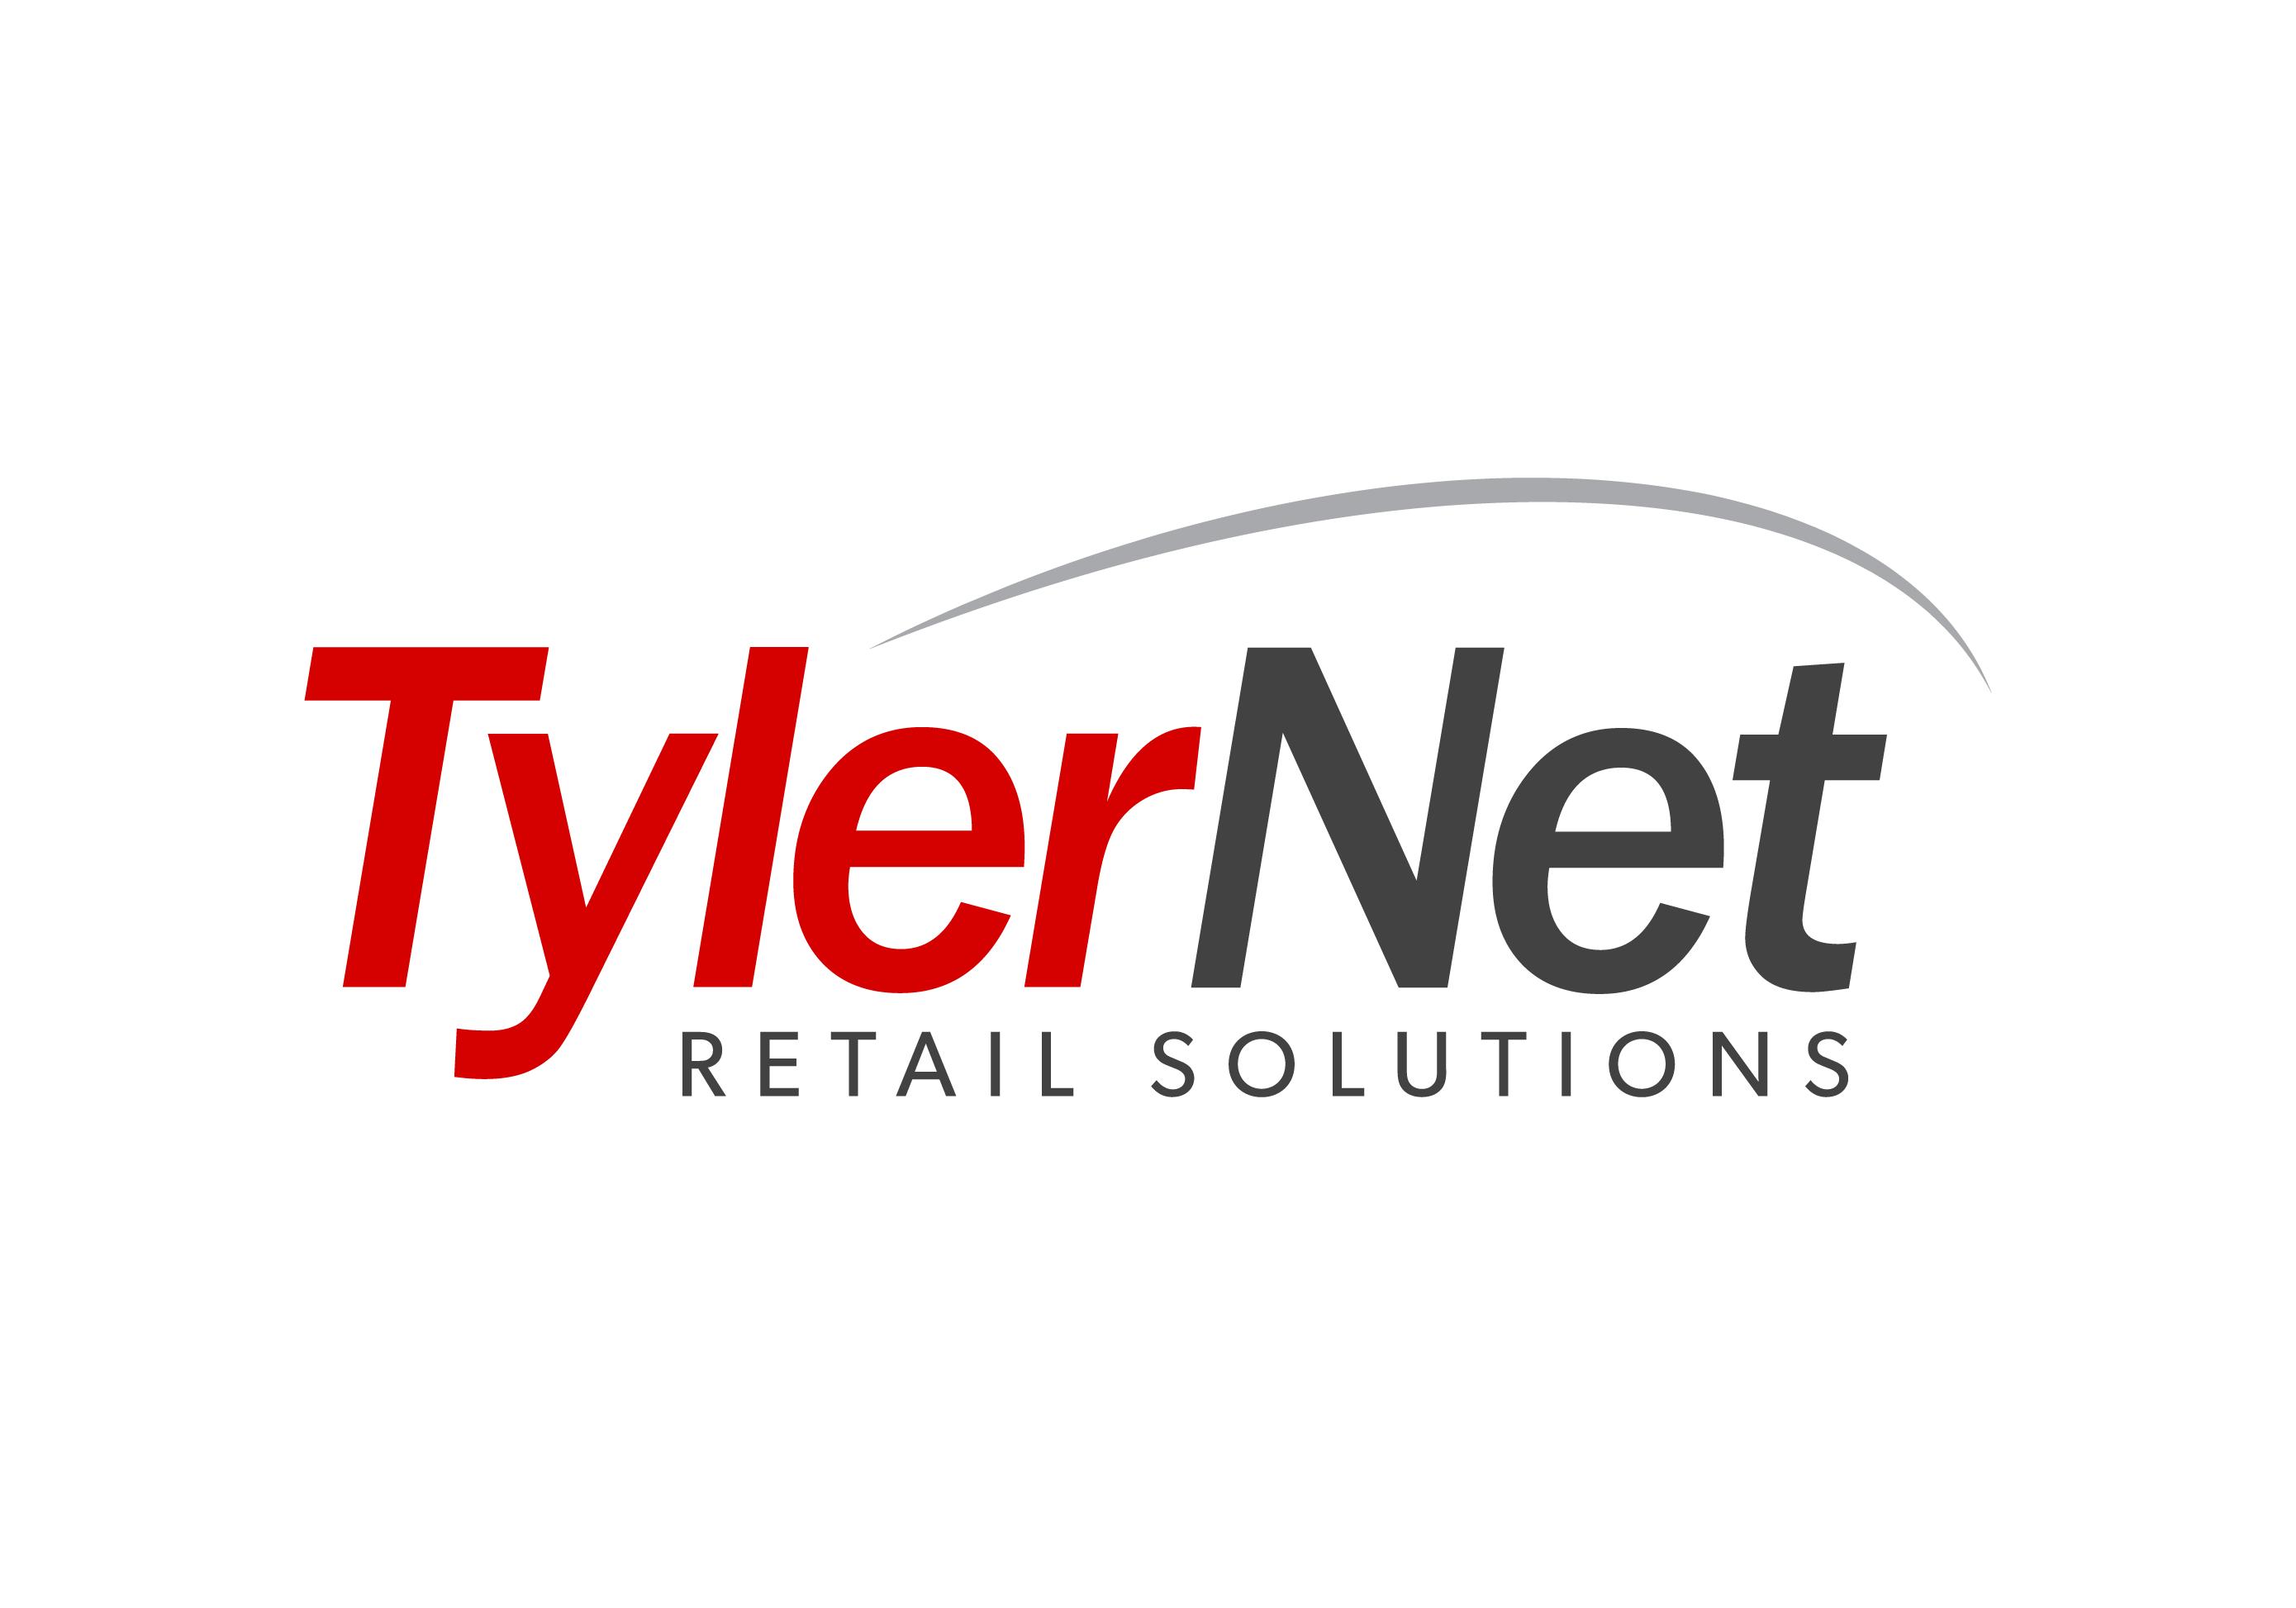 tyler-net payment processing